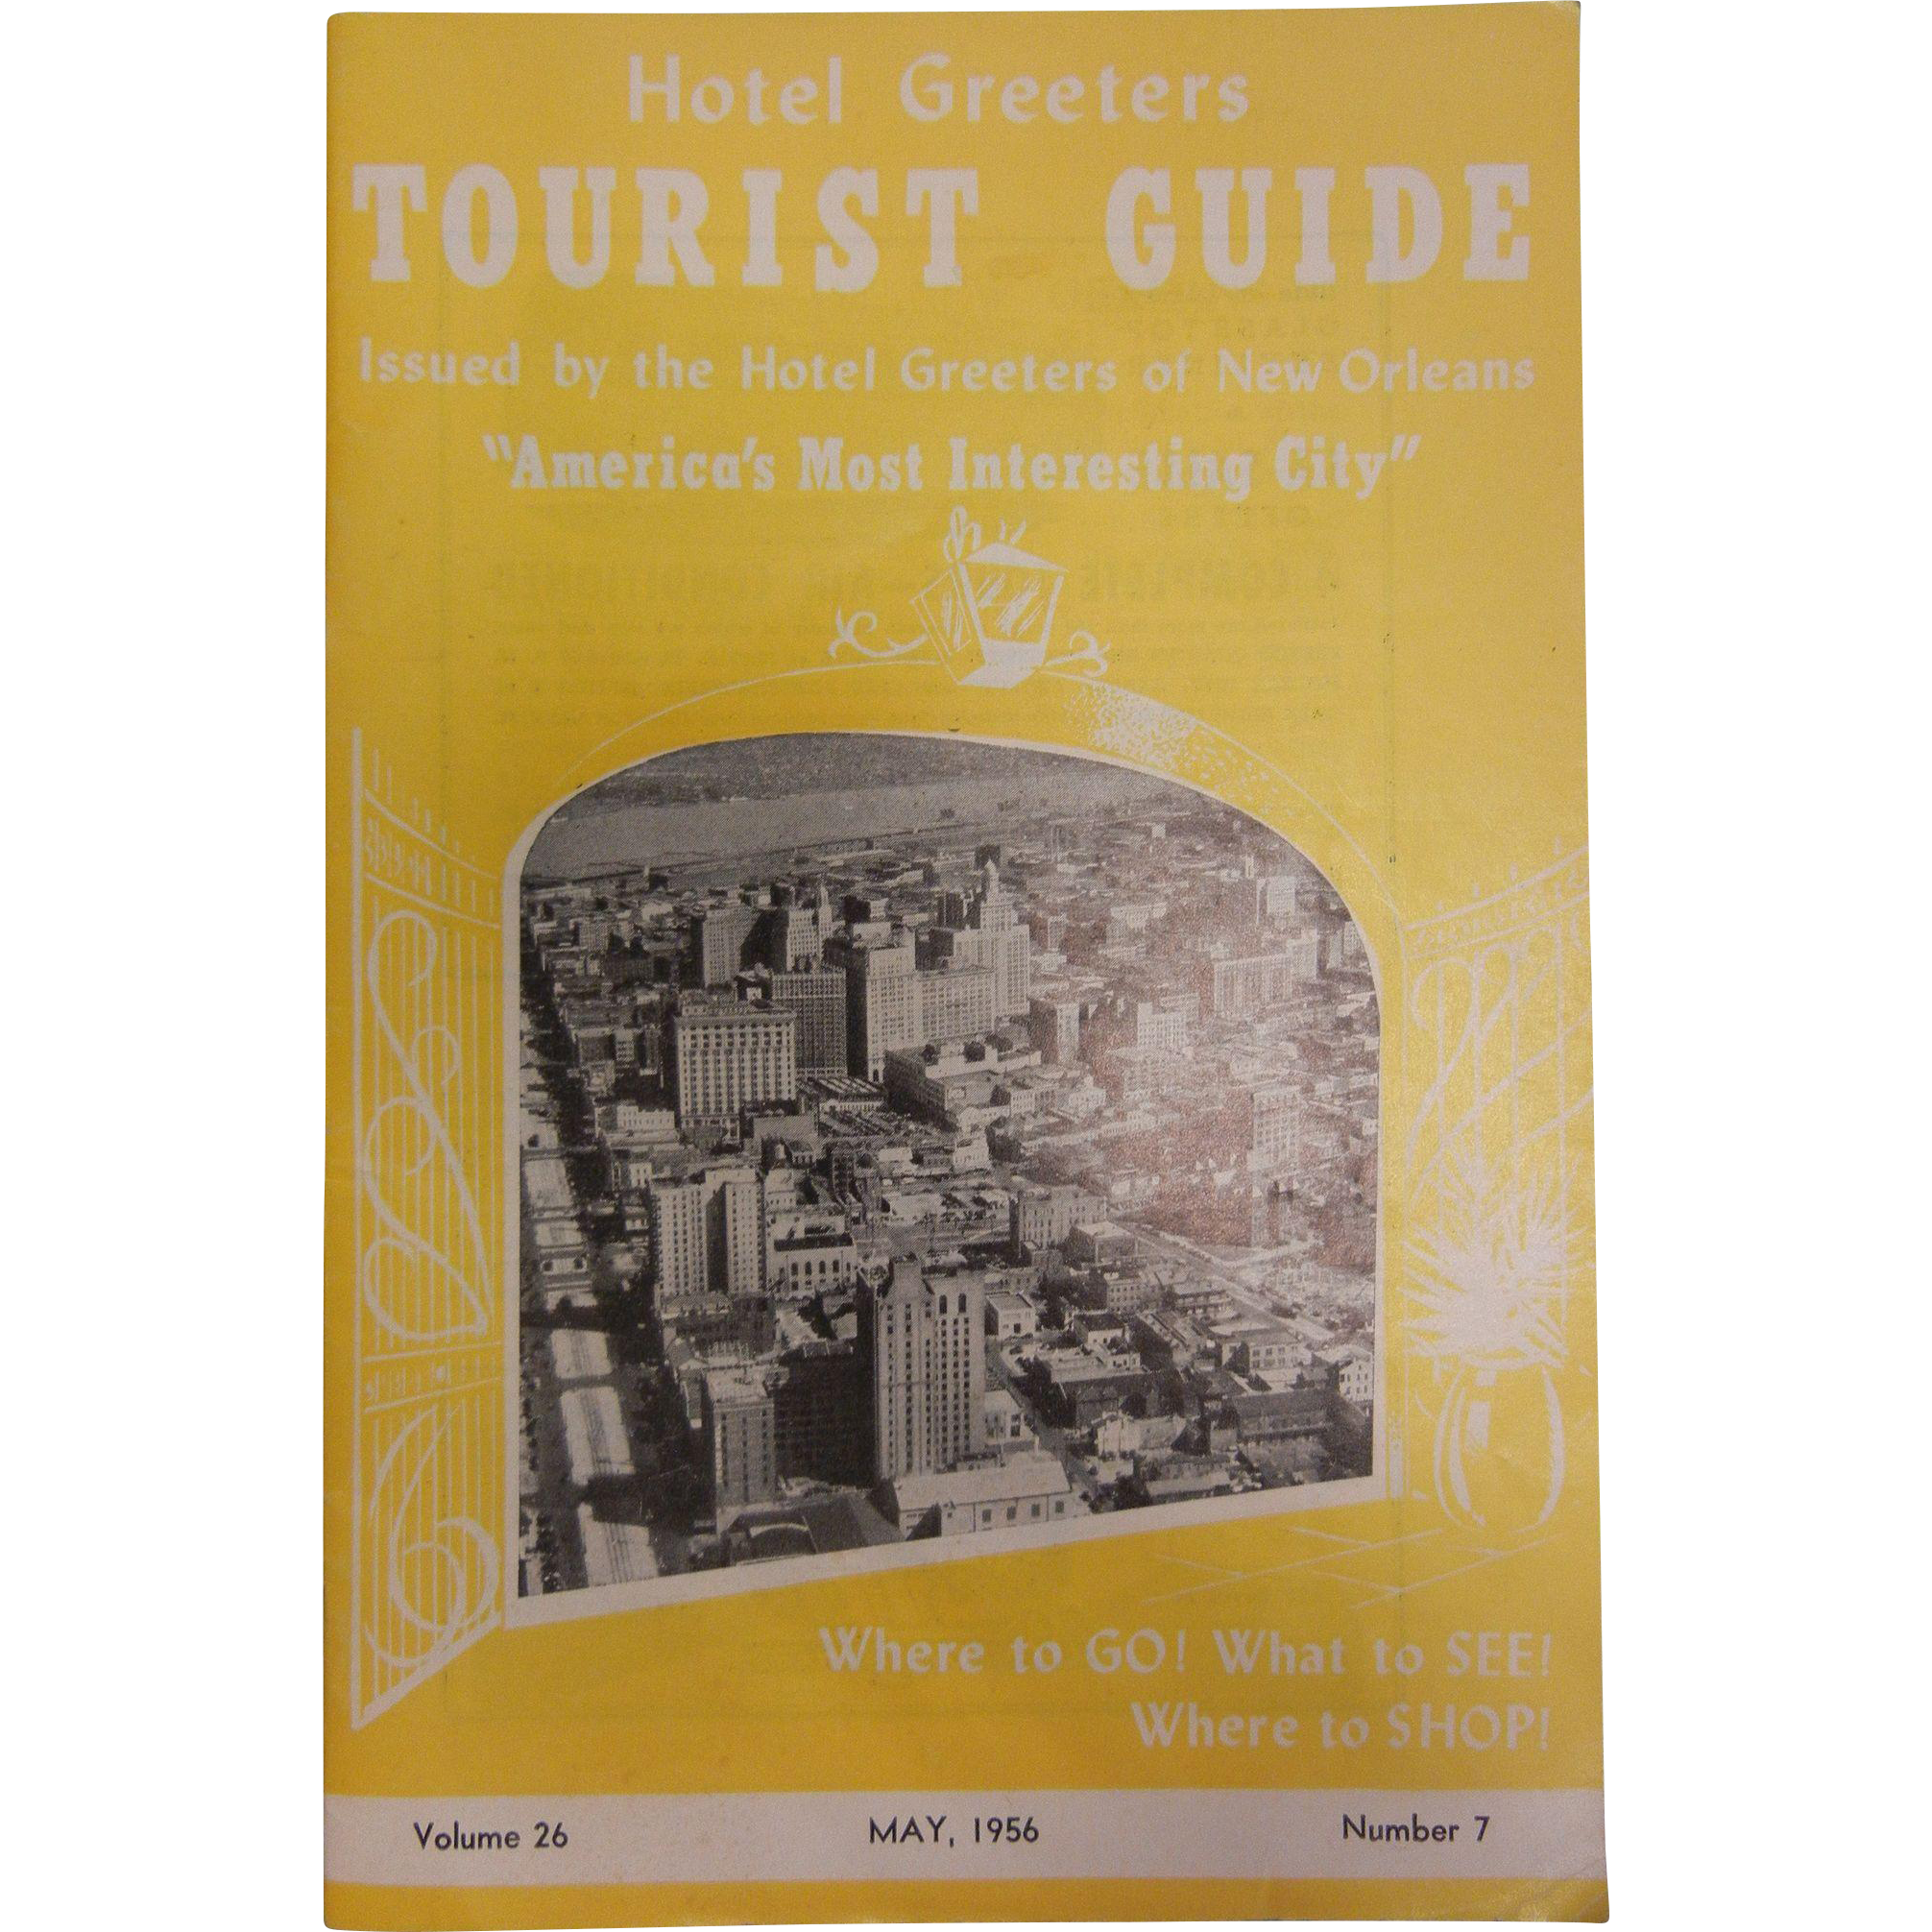 Vintage 1956 New Orleans Tourist Guide Booklet Vol. 26 No. 7